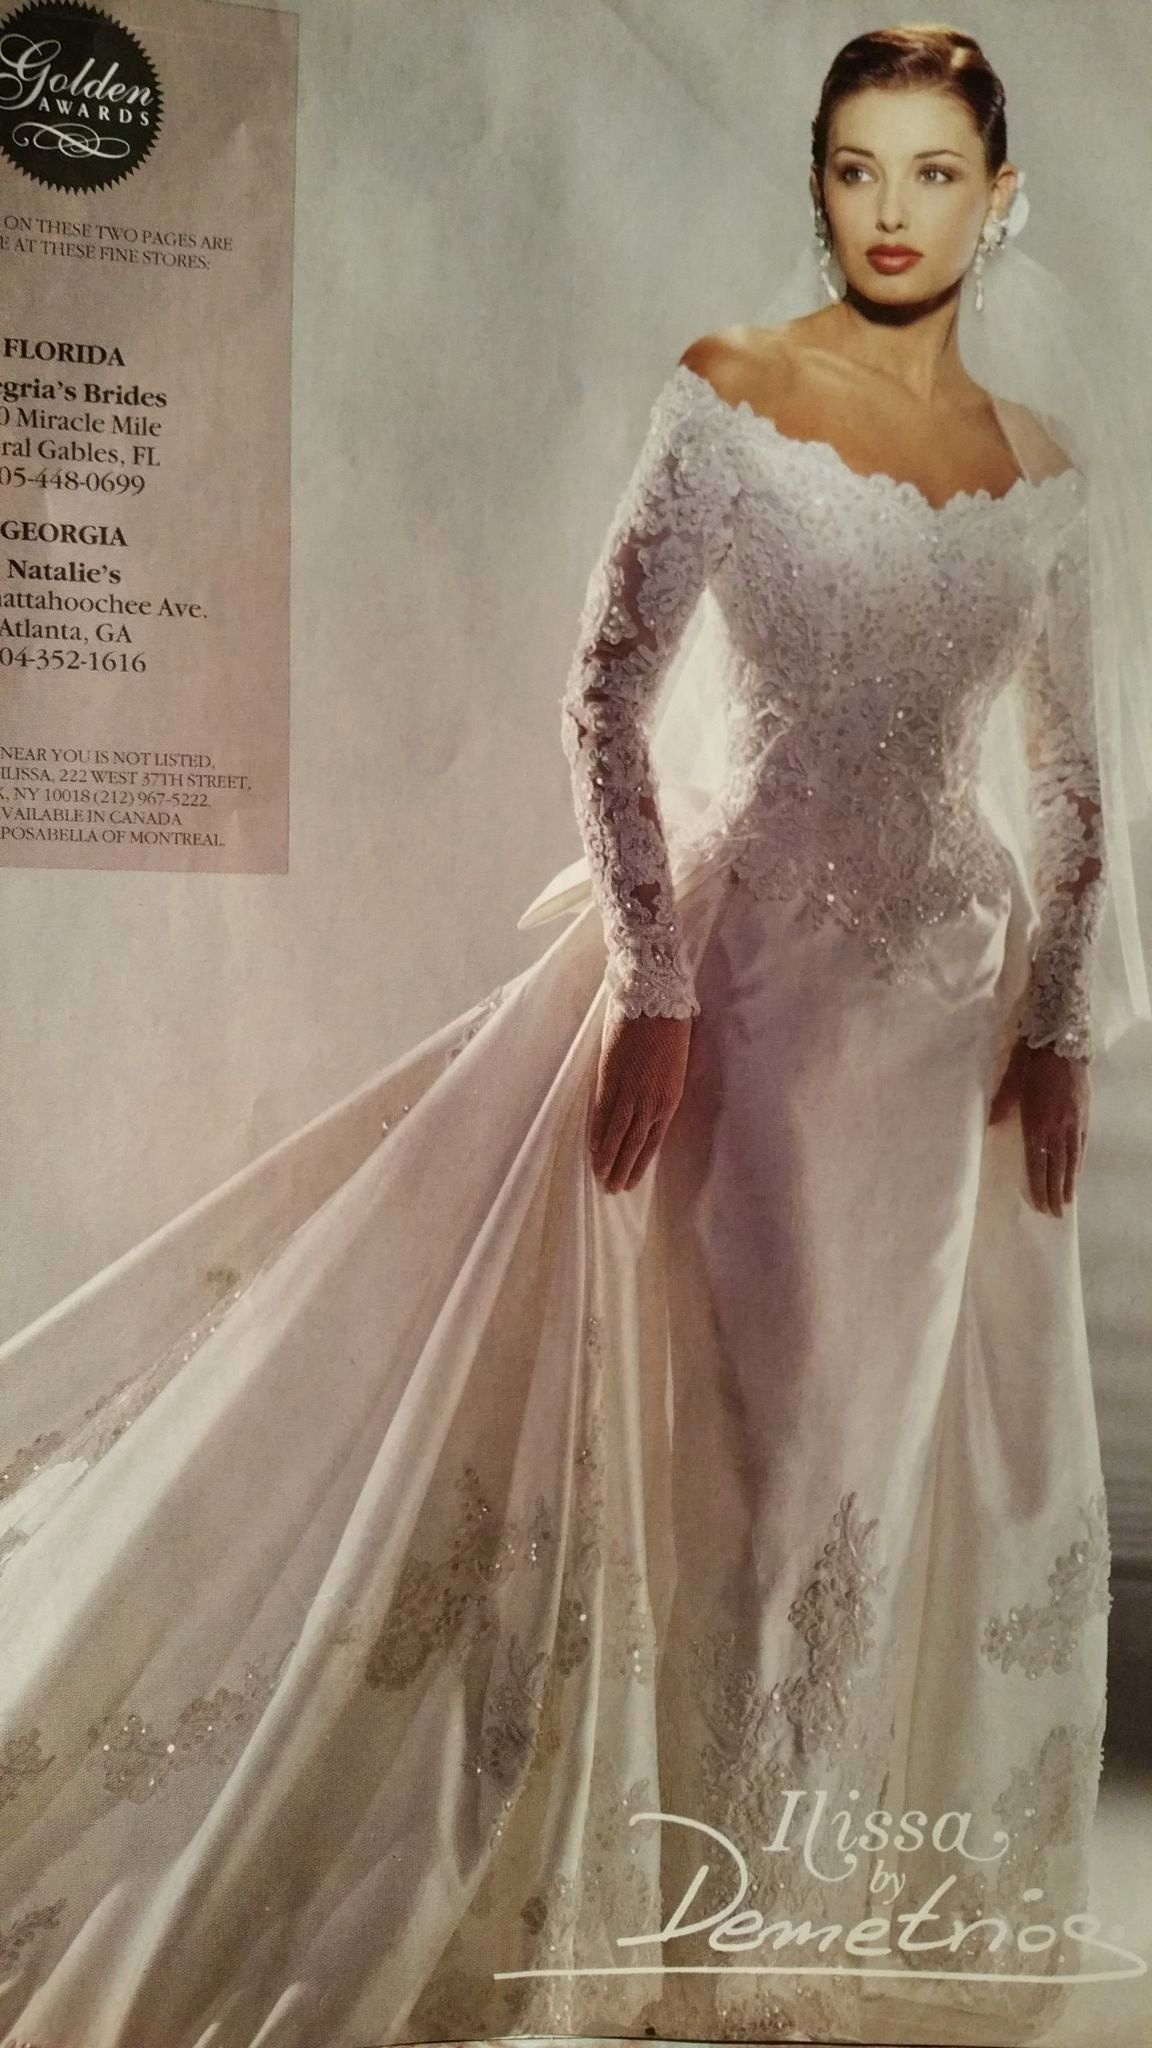 Kleinfeld Bridal New York In 2020 Demetrios Wedding Dress Wedding Gowns Vintage Wedding Dresses